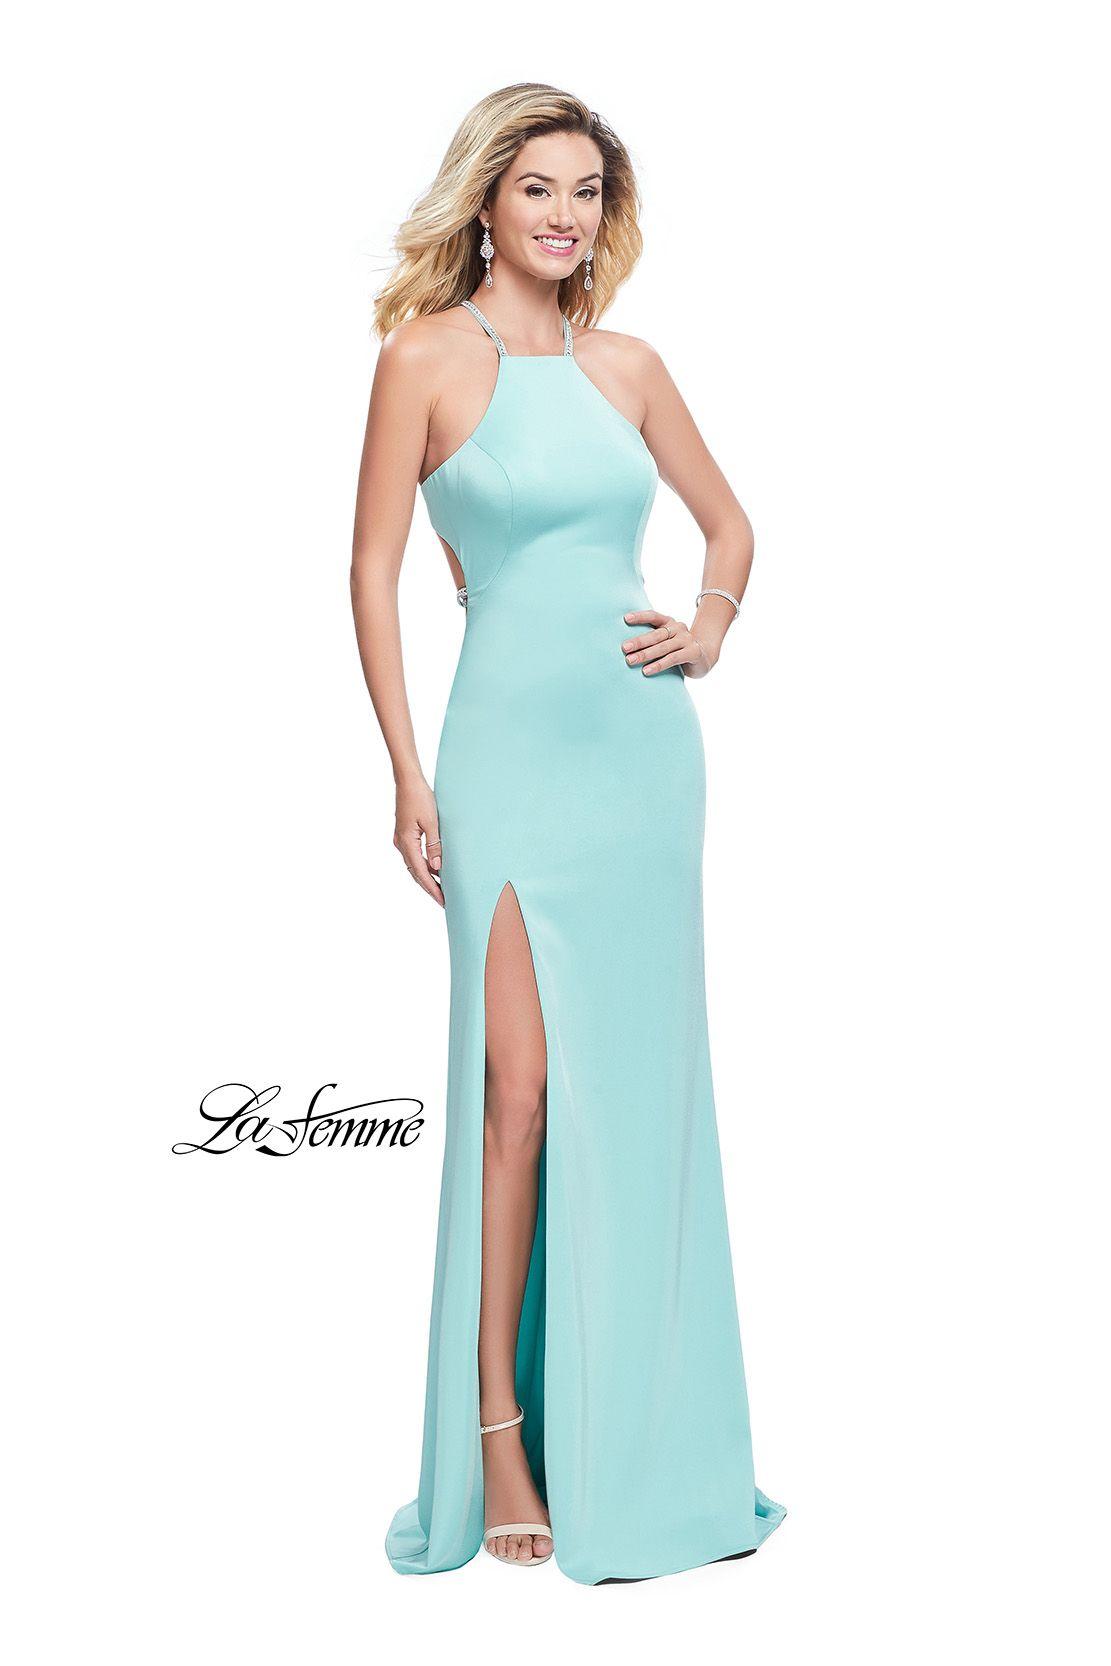 La Femme 25459- International Prom Association Dresses | La Femme ...